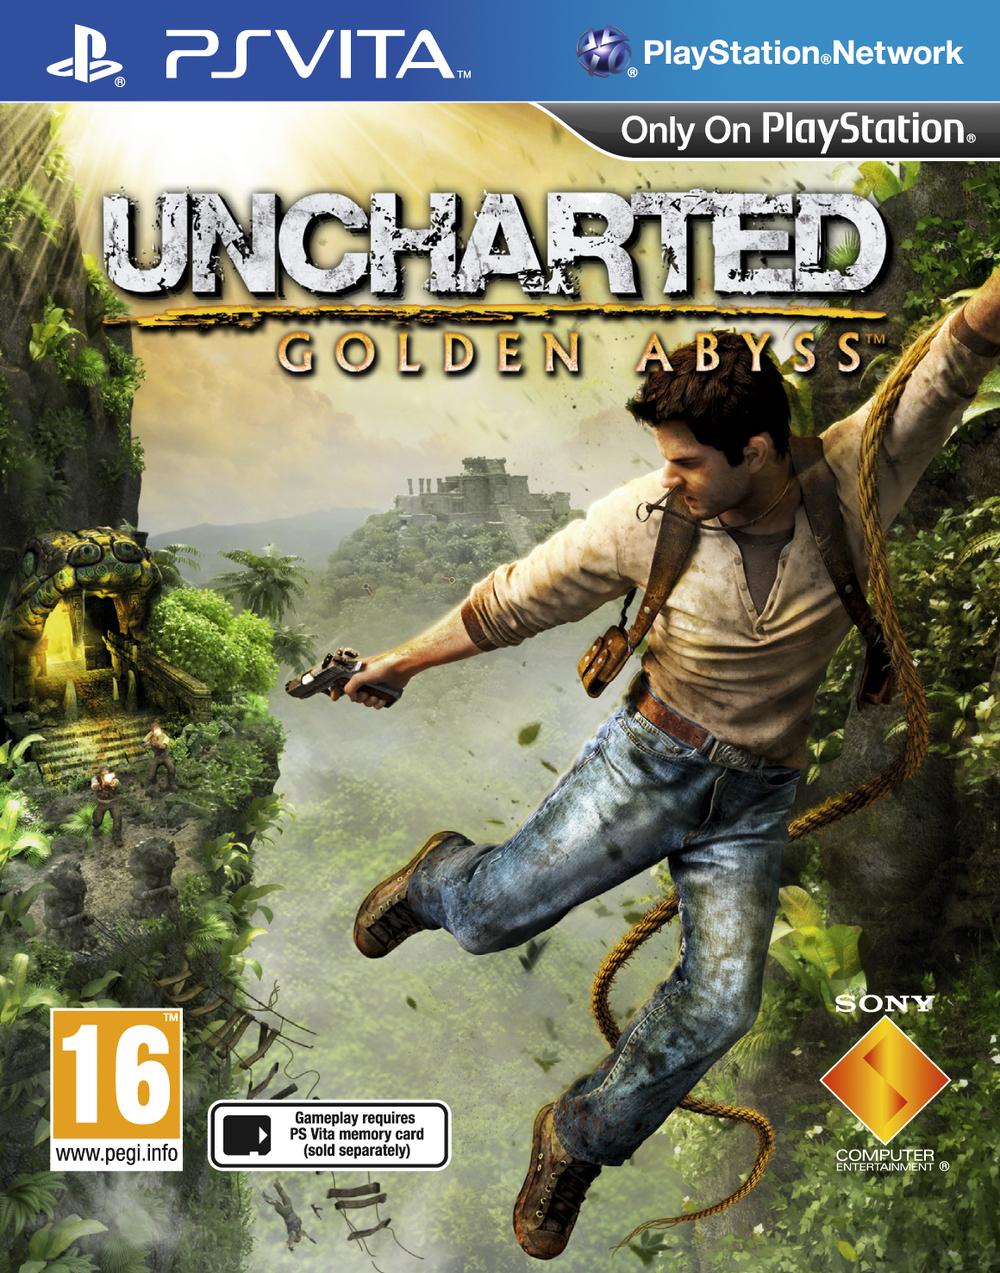 Uncharted-Golden-Abyss-PS-Vita-Packshot.jpg